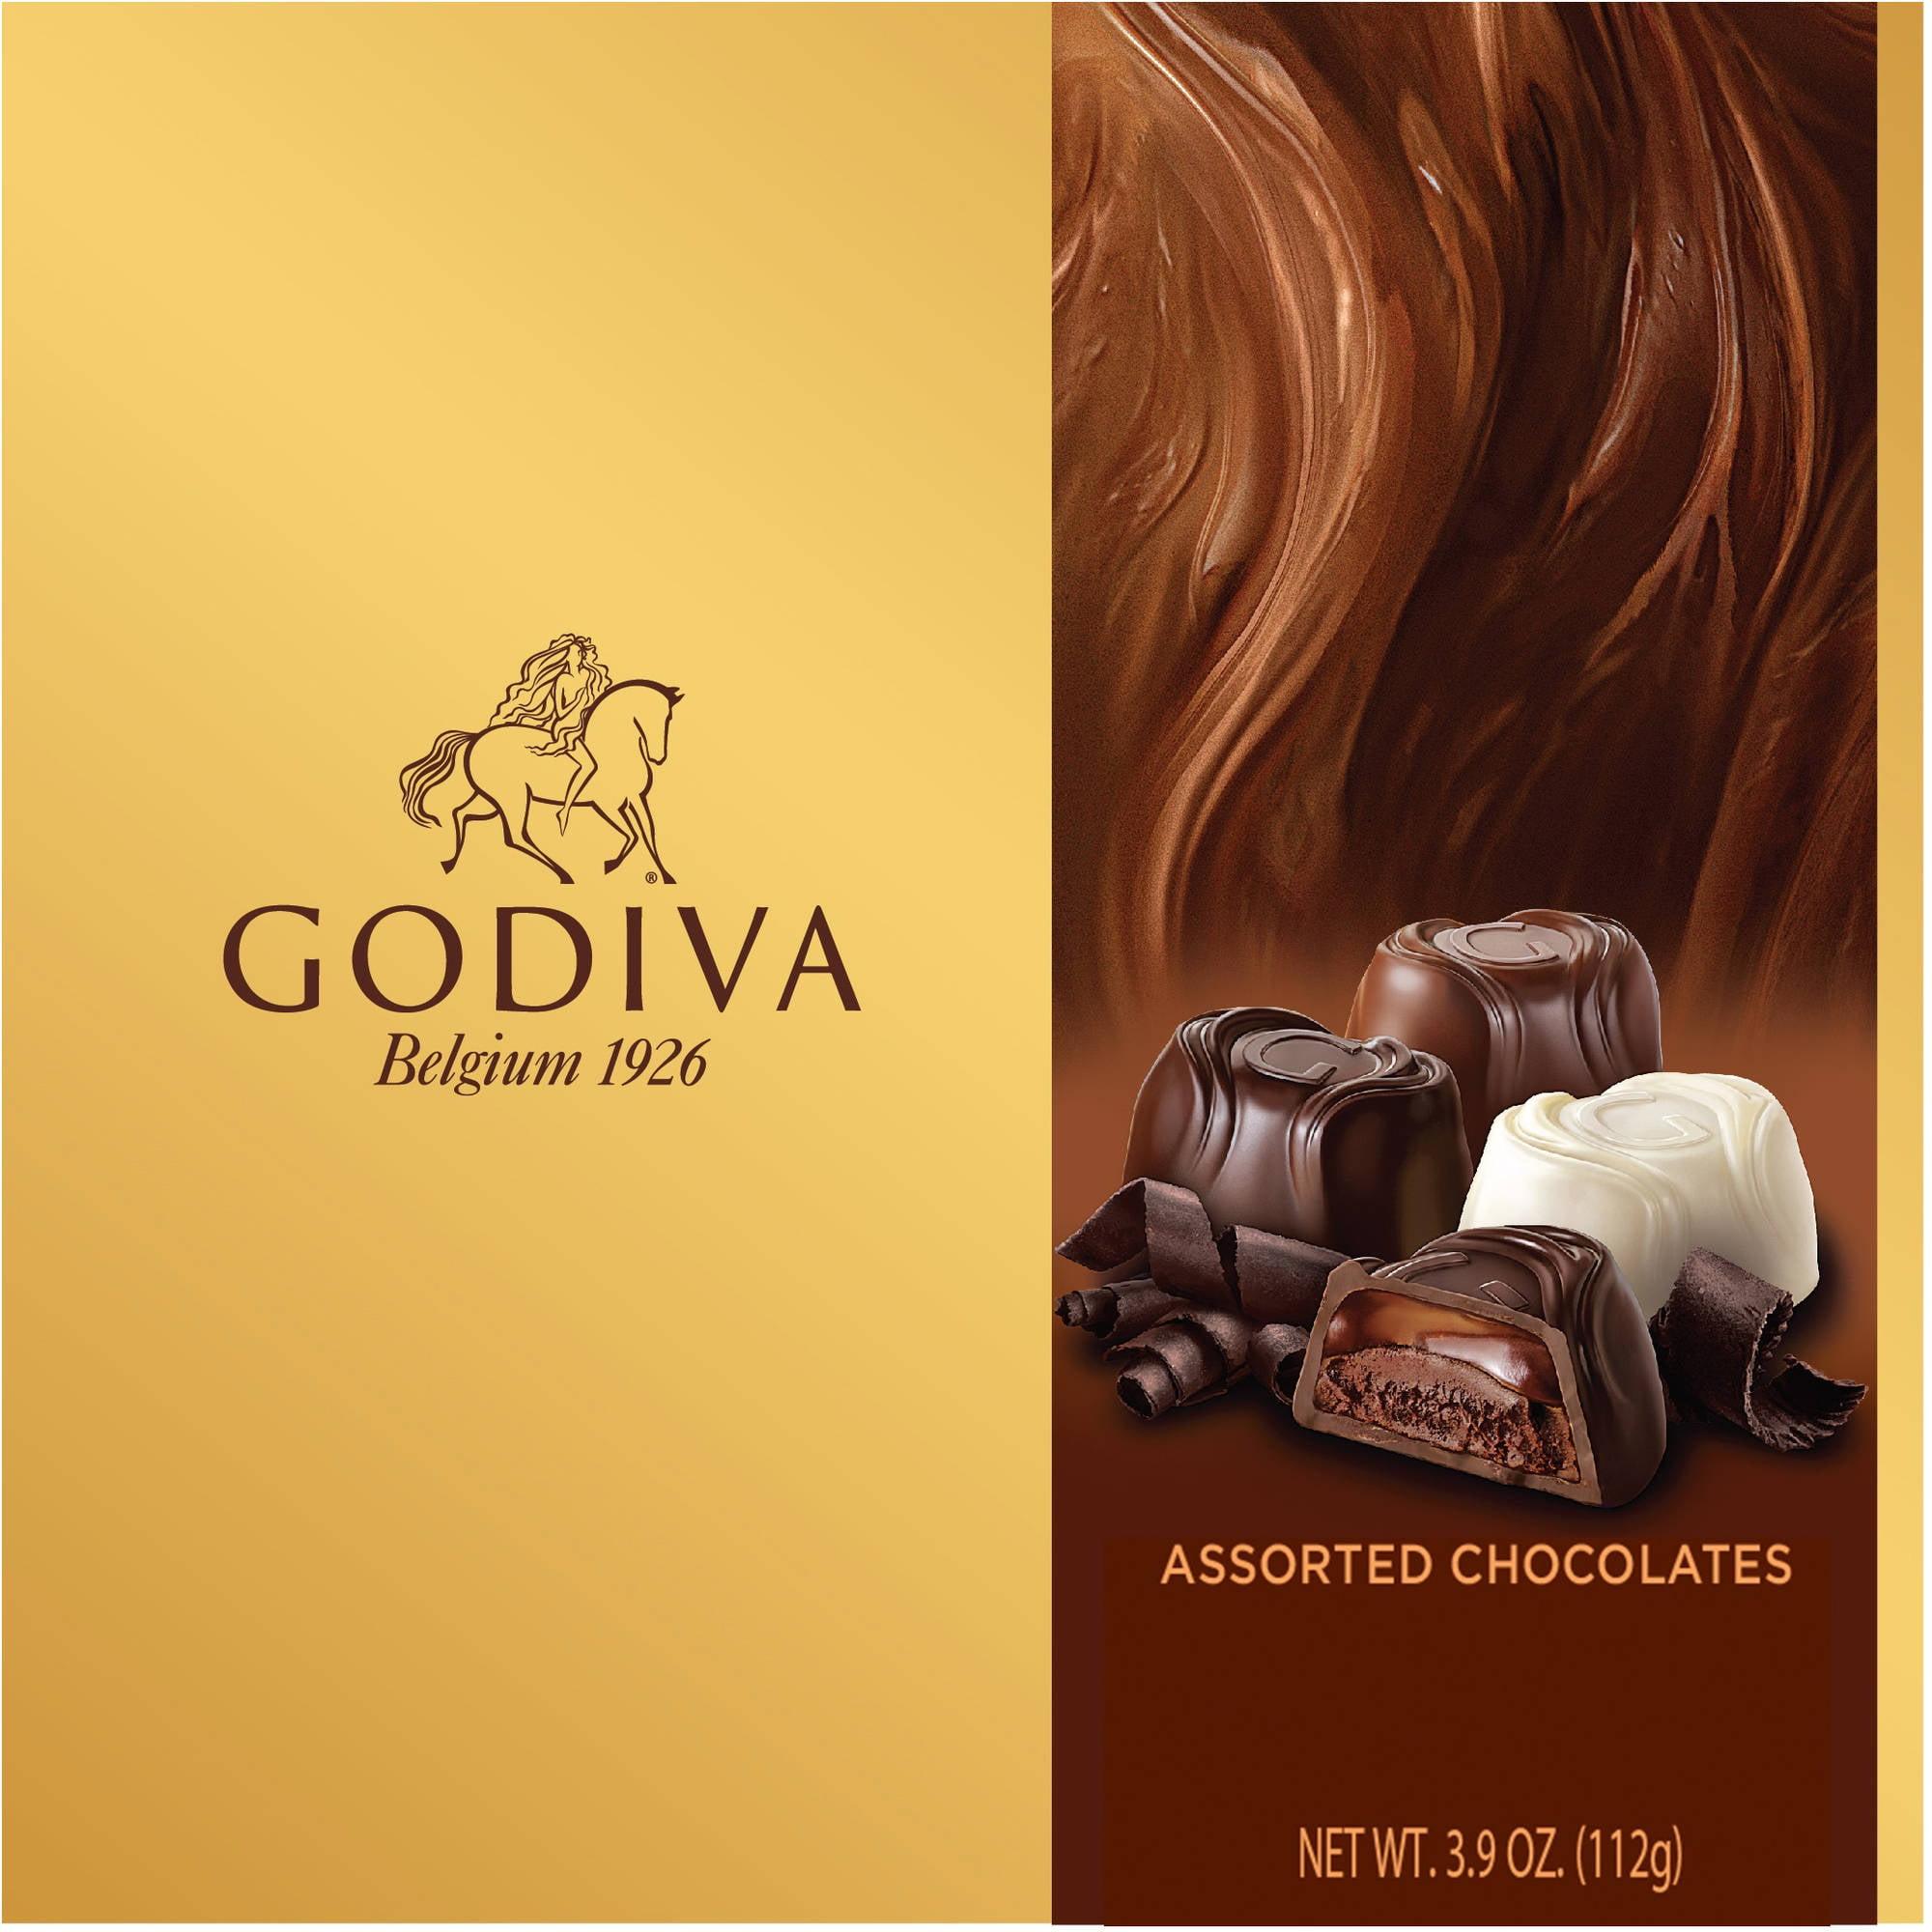 Godiva Assorted Chocolates Gift Box, 3.9 oz